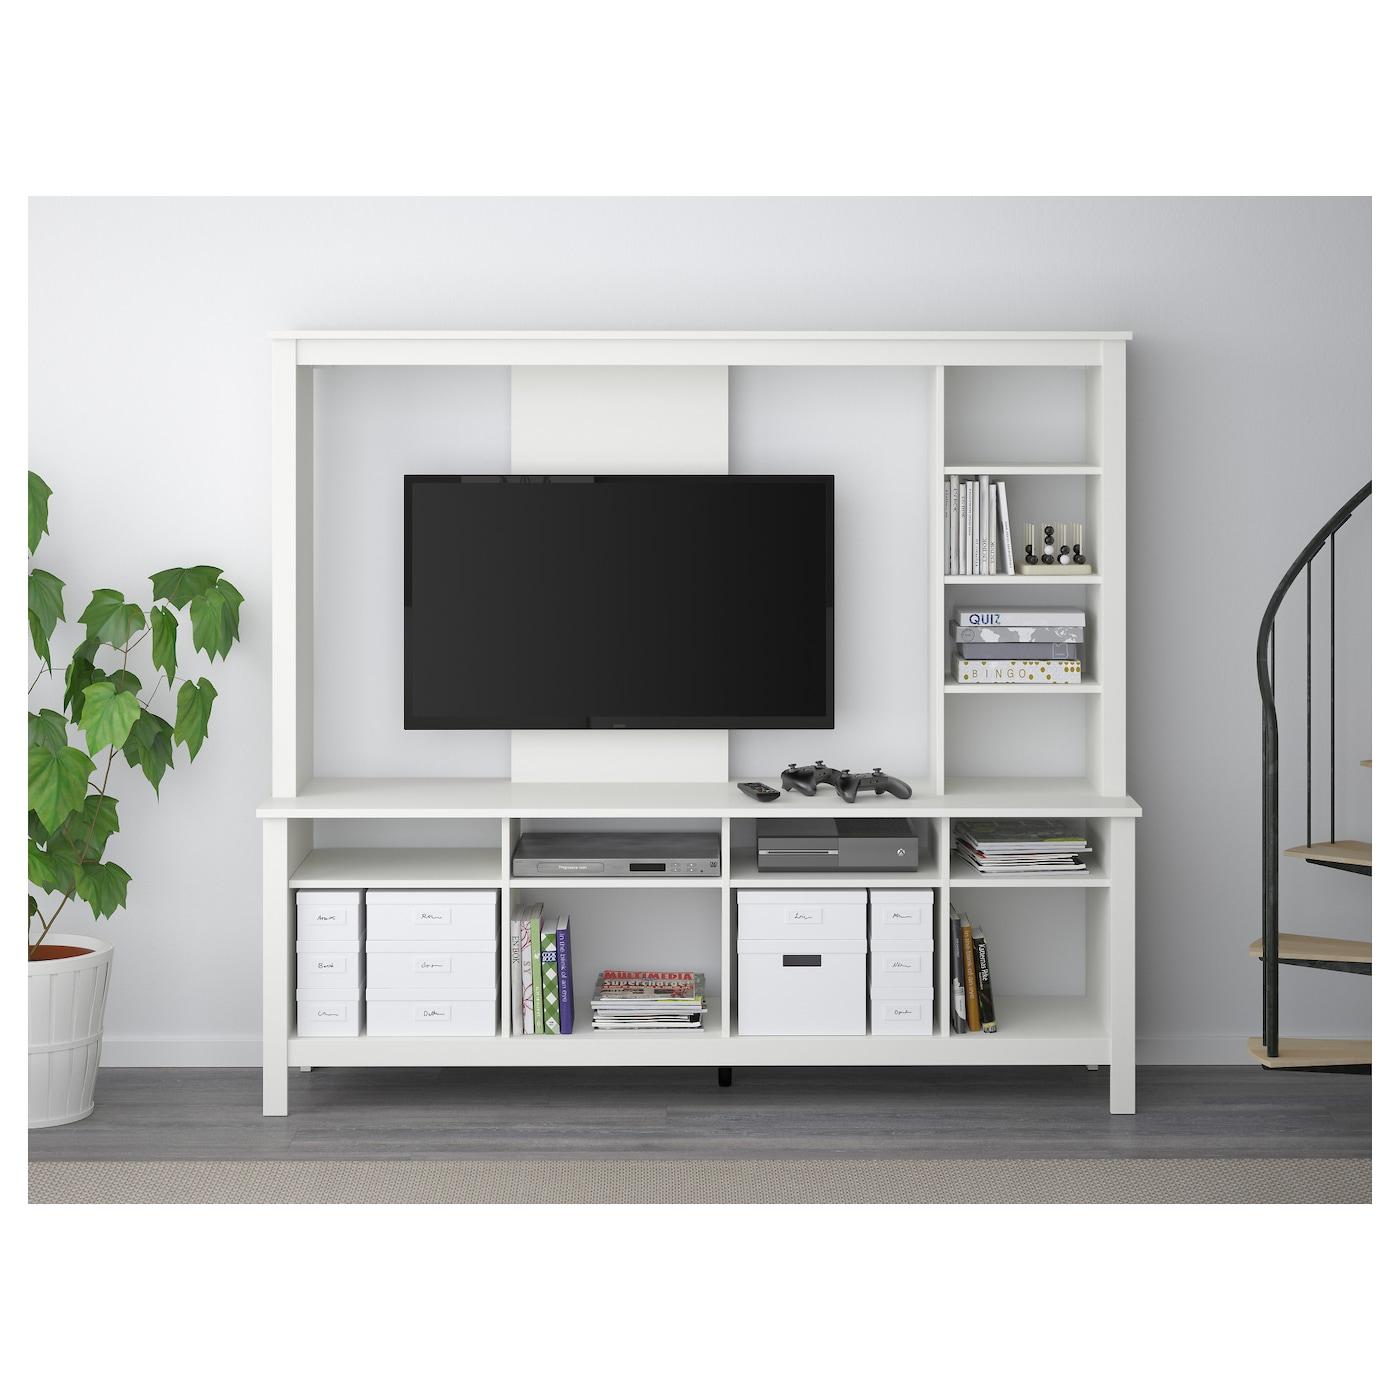 Tomn S Meuble Tv Blanc 183x48x163 Cm Ikea # Meuble Tv Avec Rangement Ikea